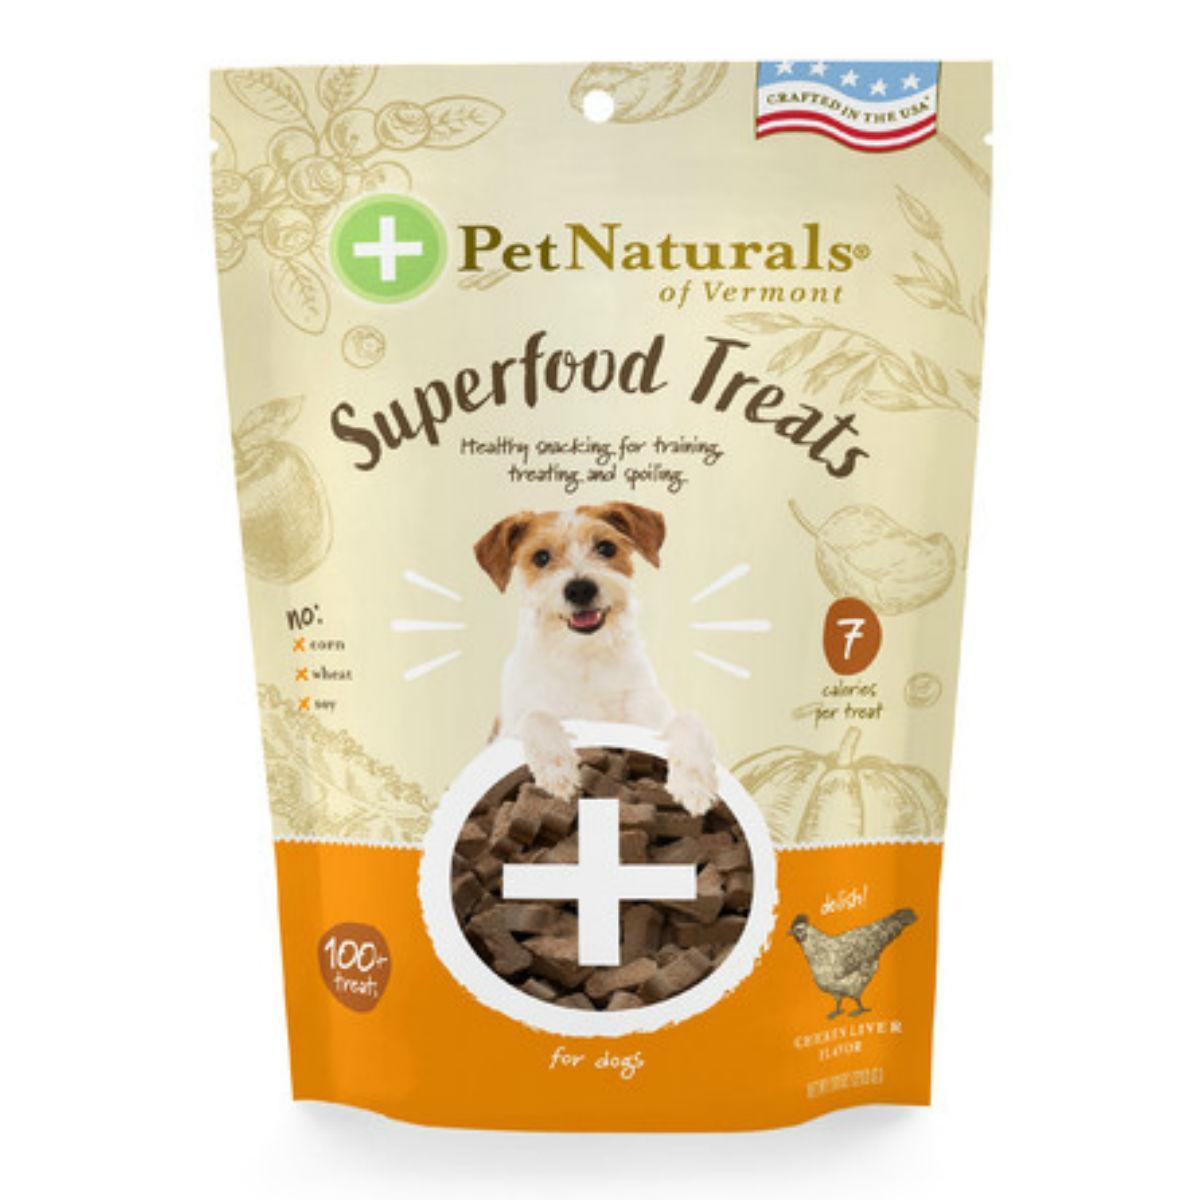 Pet Naturals Superfood Dog Treats - Homestyle Chicken Flavor